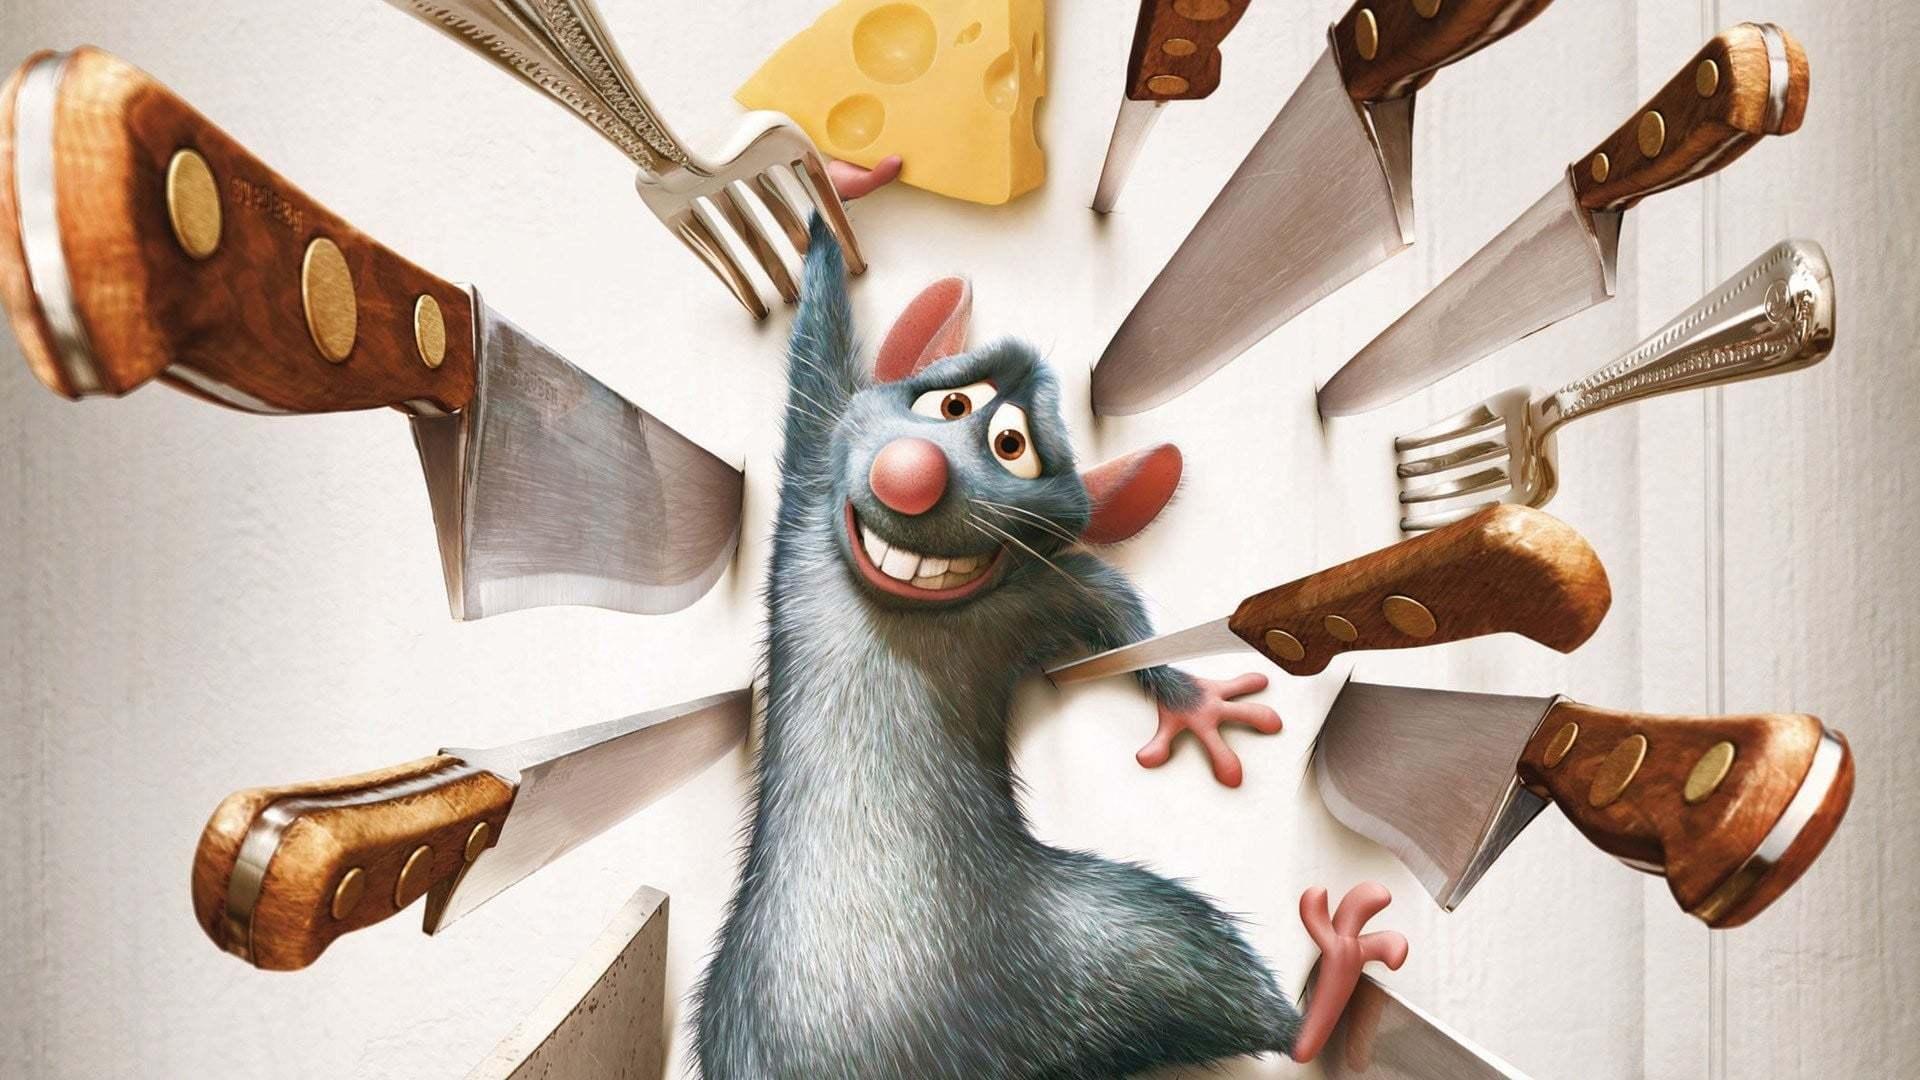 Кадры из фильма Рататуй Ratatouille 2007